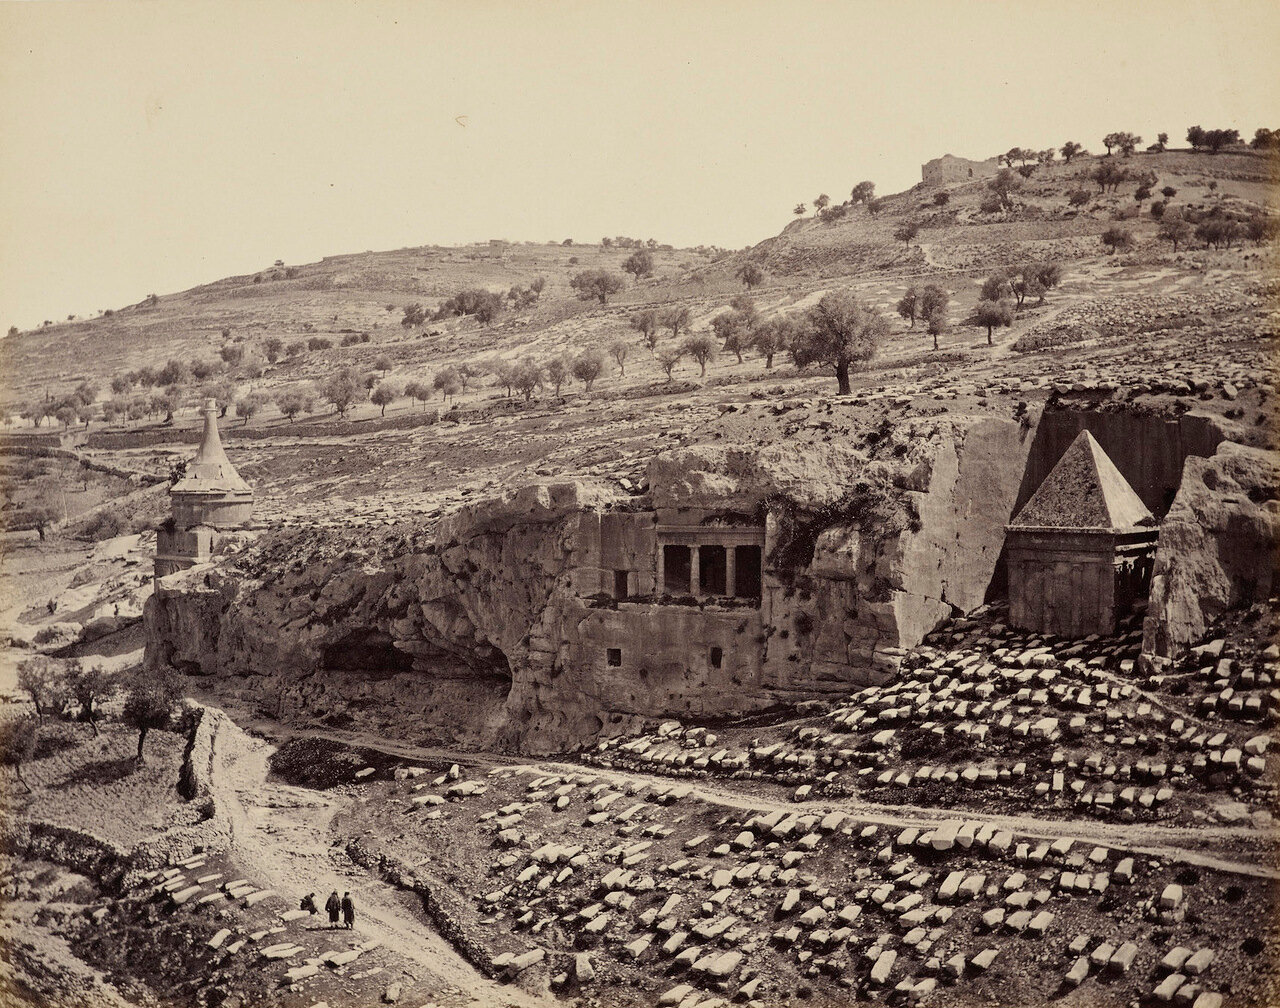 2 апреля 1862. Вид долины Иосафата. Гробница Авессалома и гробница Захарии. Иерусалим